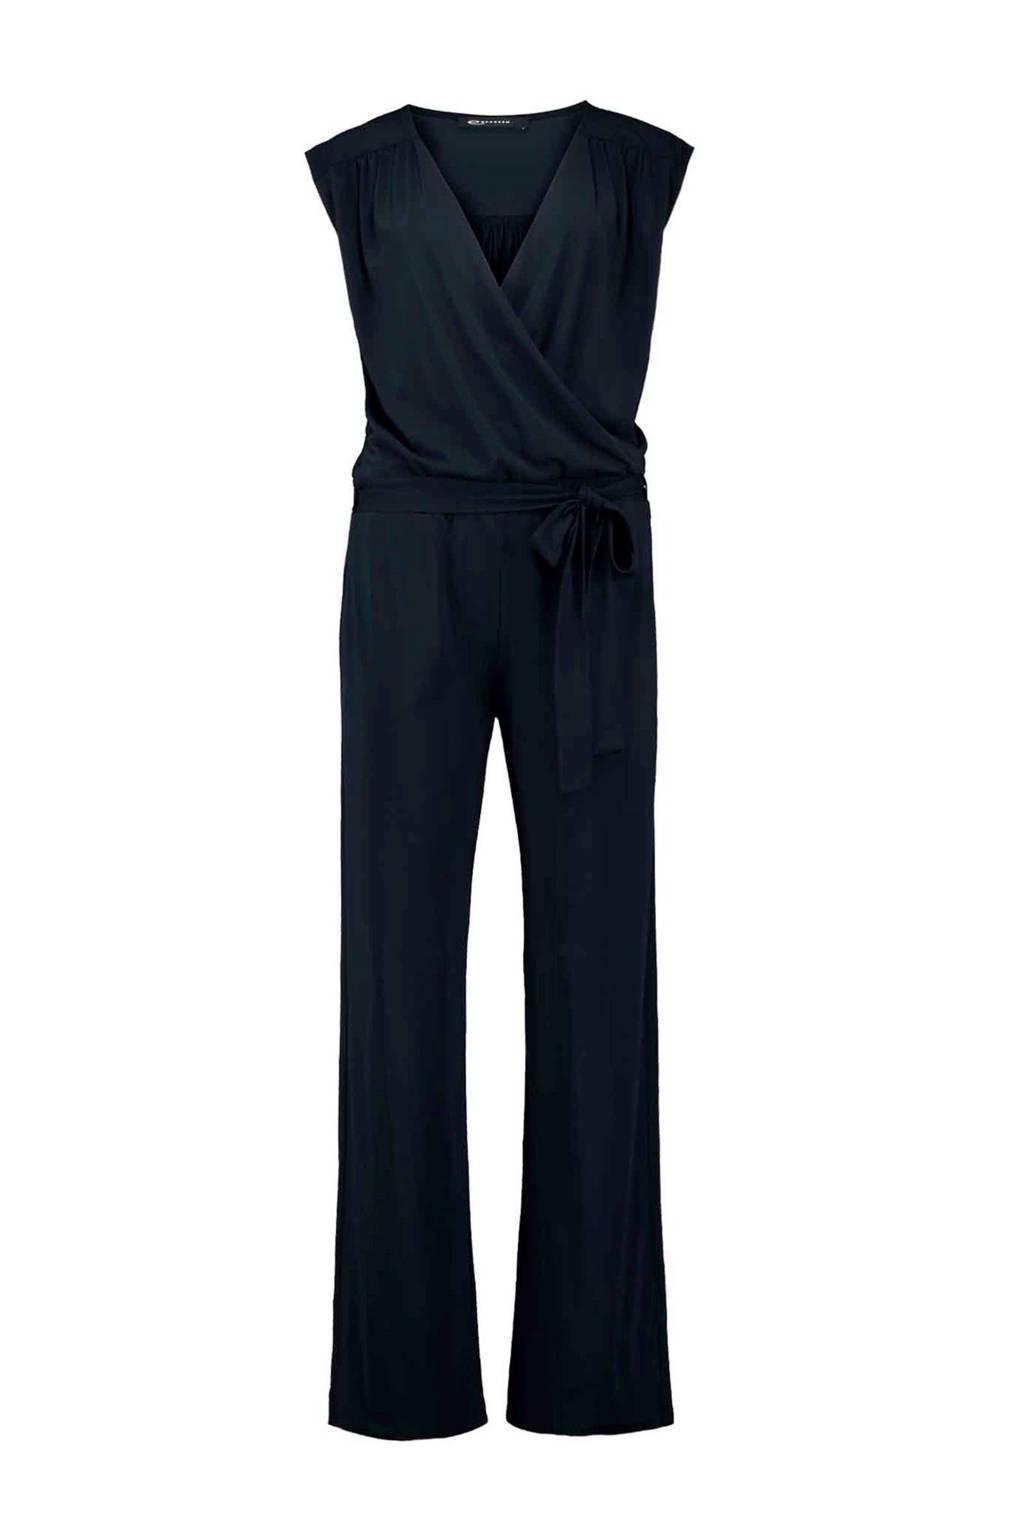 65fdf058bfb Expresso Elsanne jumpsuit donkerblauw